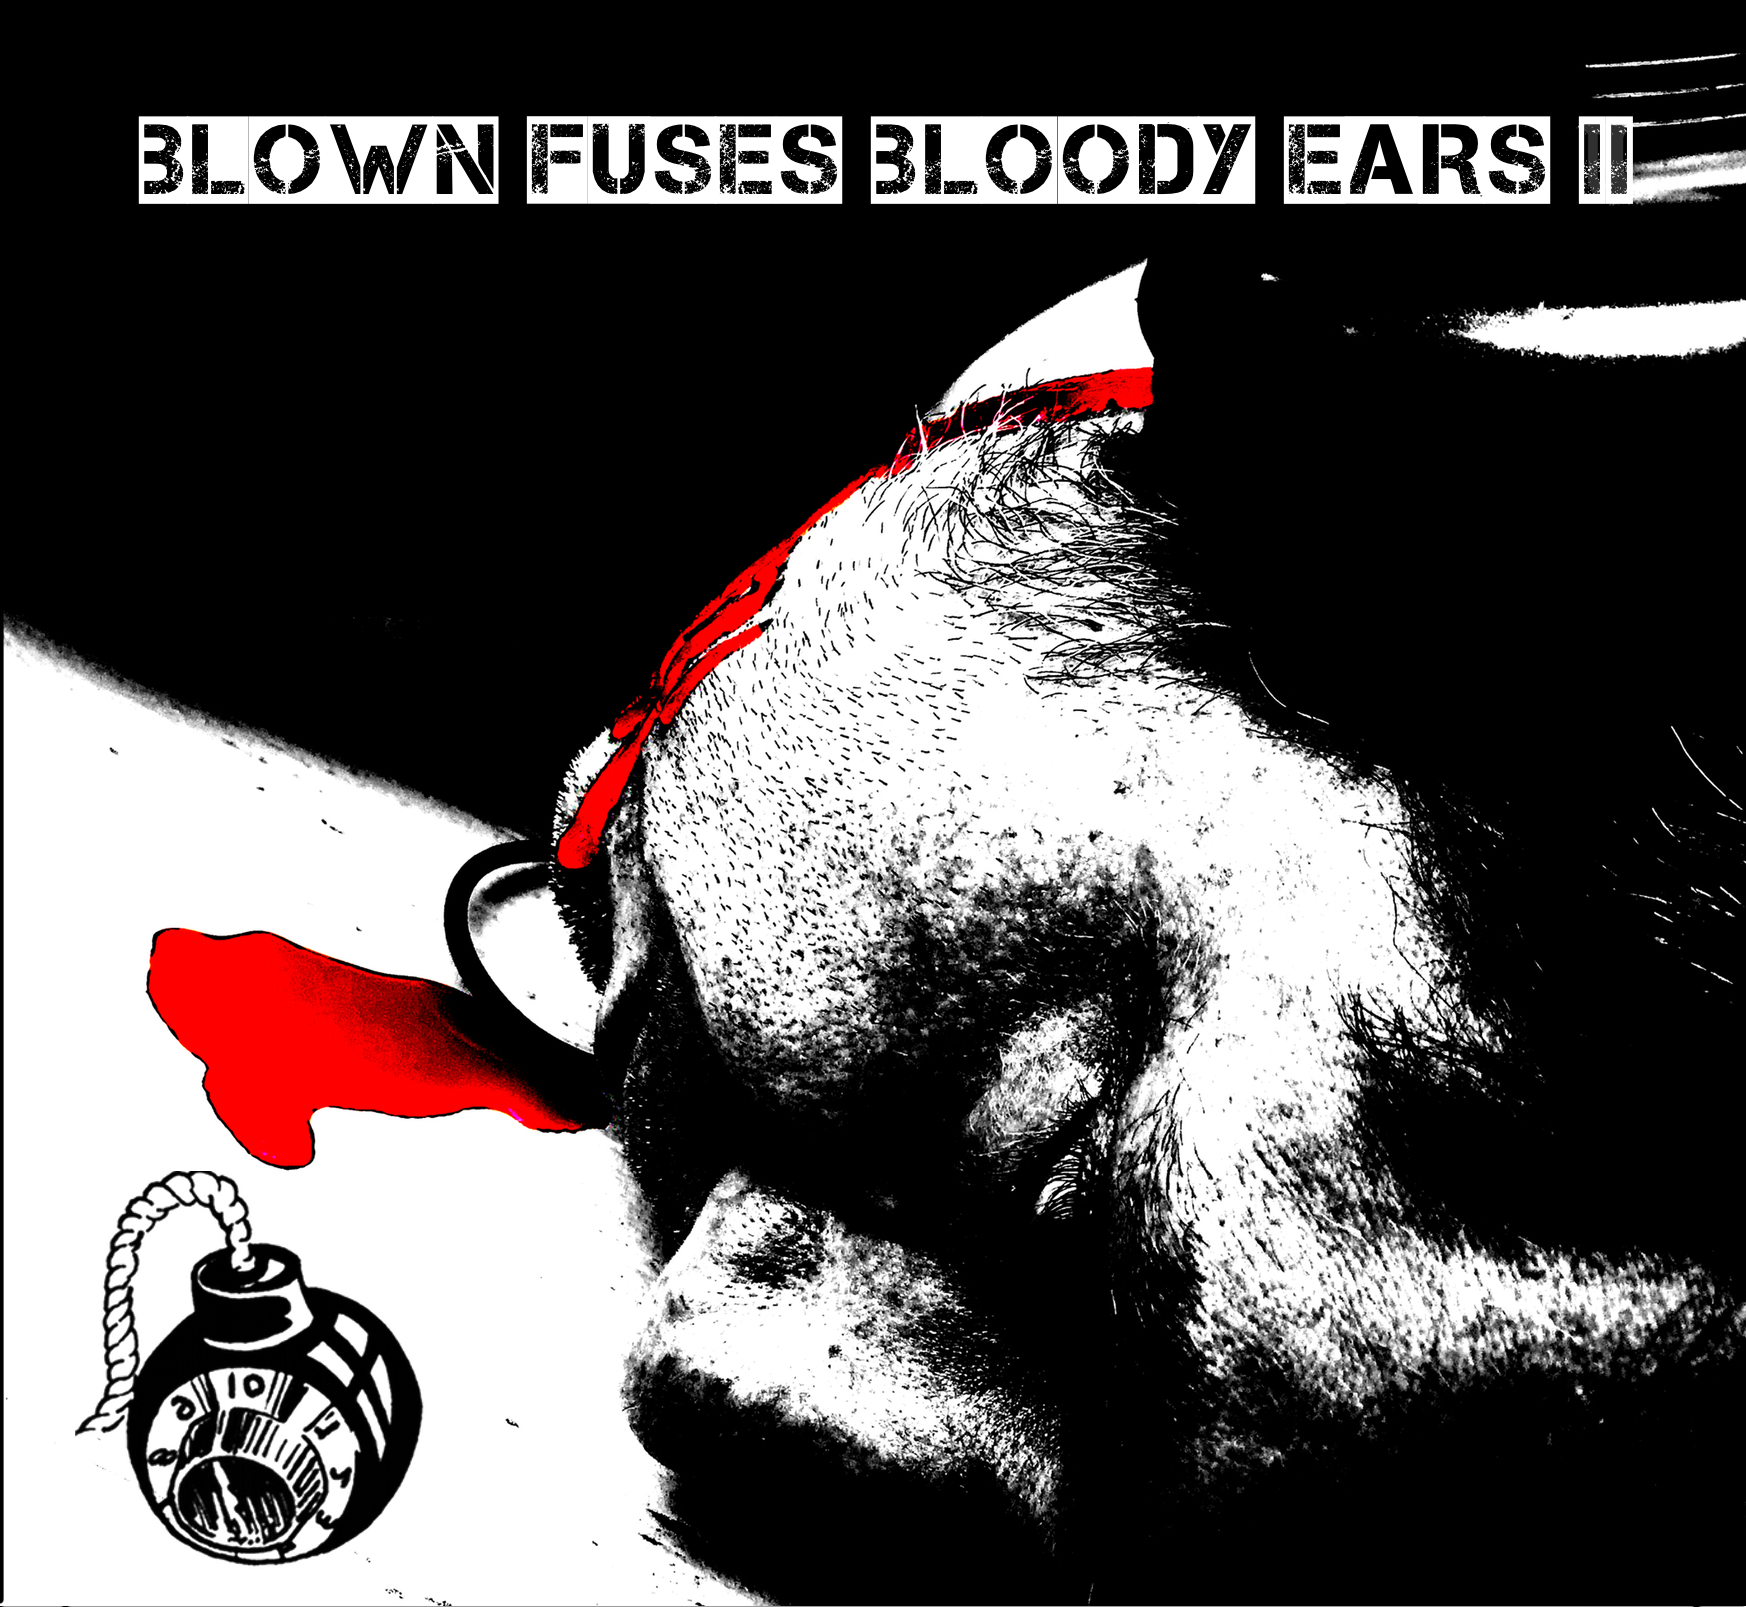 Blown Fuses Bloody Ears 2 FLAT JPEG.jpg